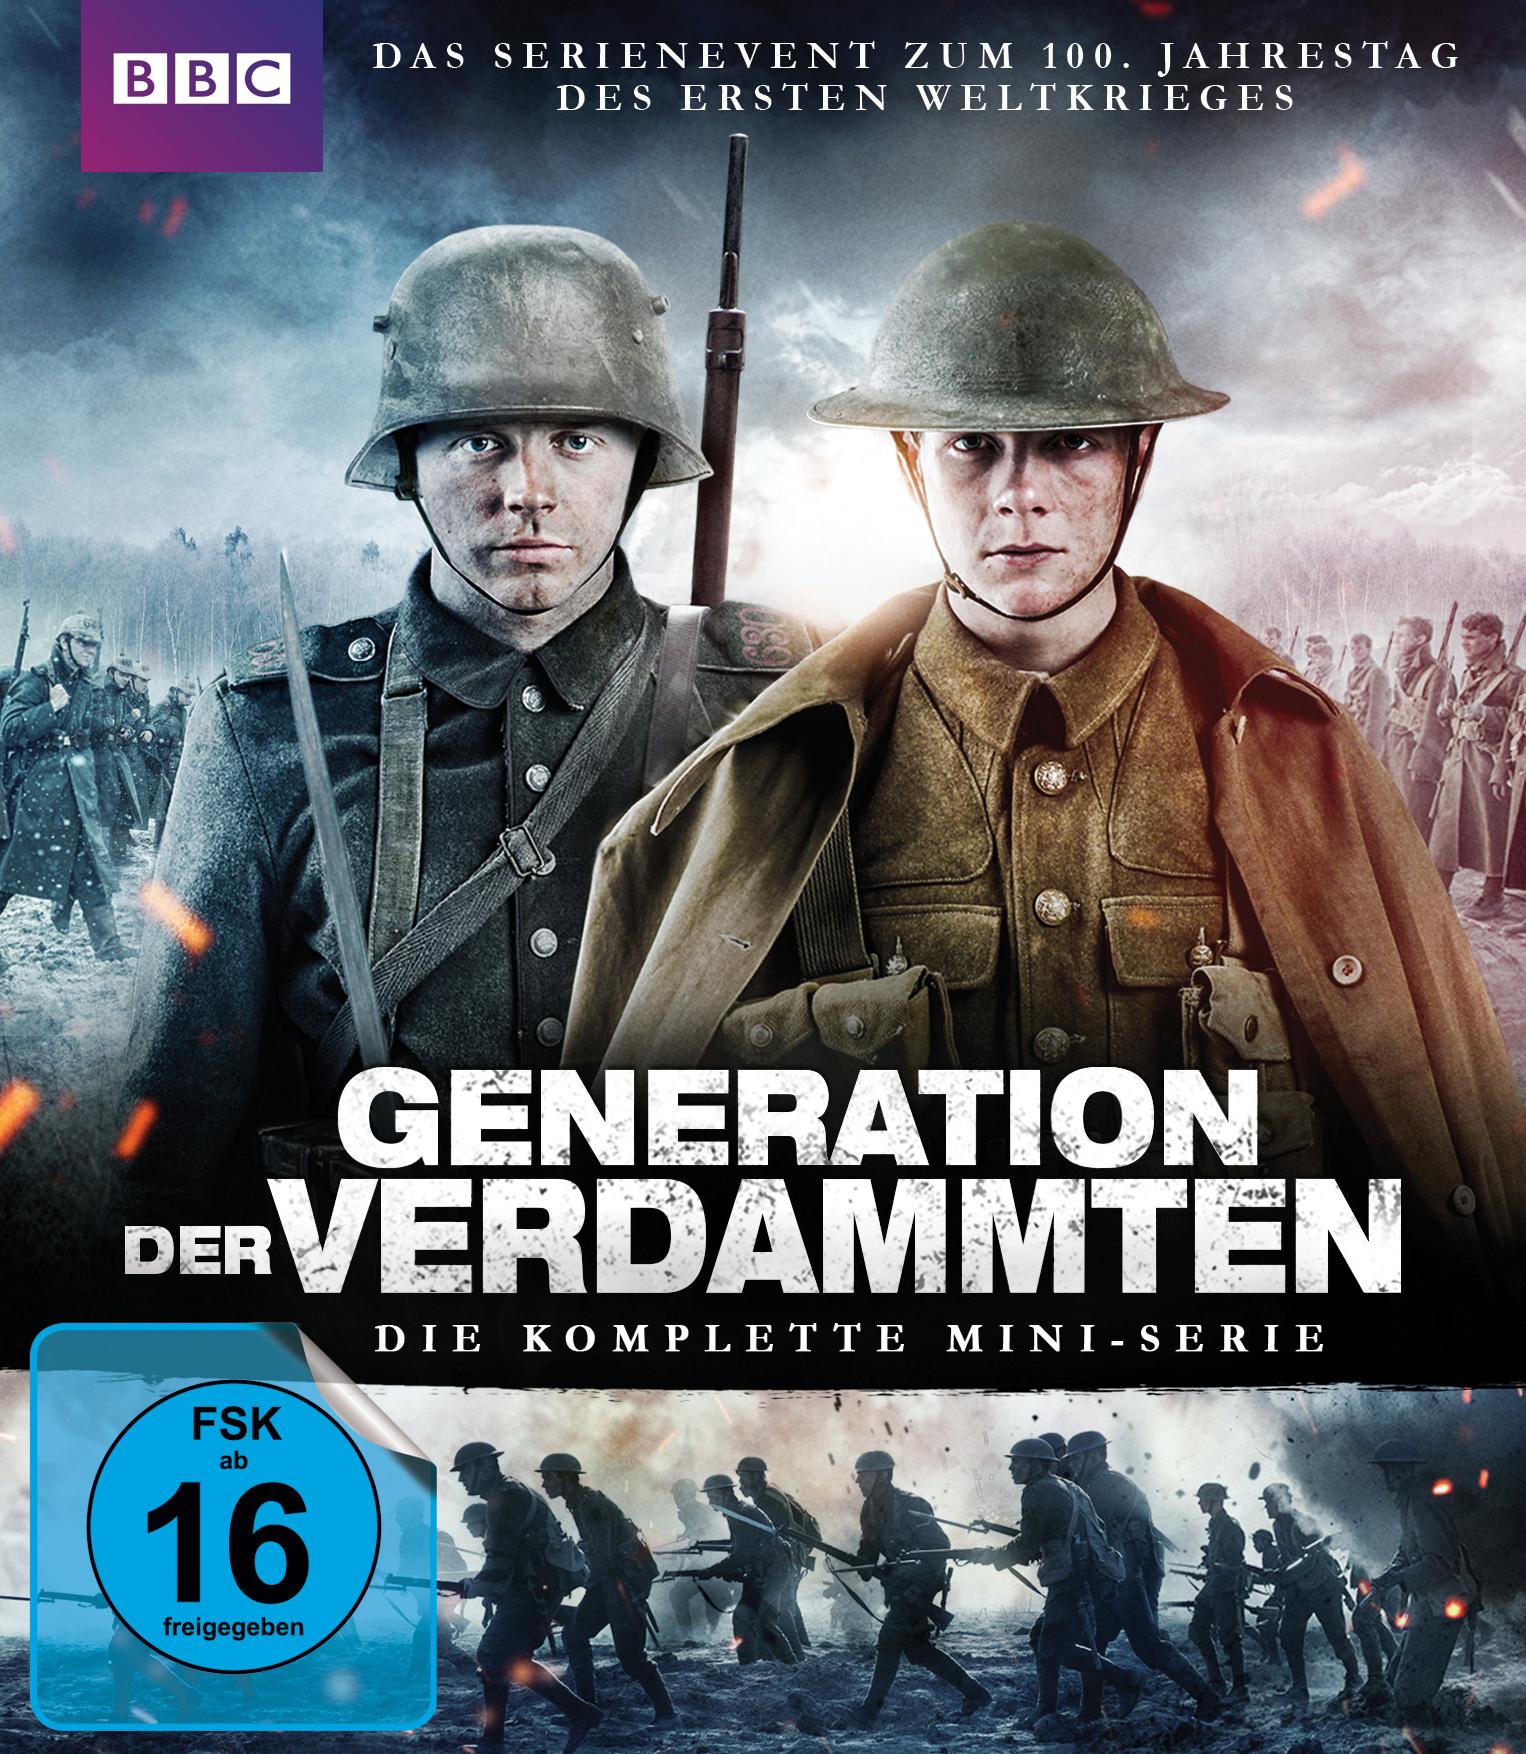 Blu-ray Kritik | Generation der Verdammten (Full HD Review)